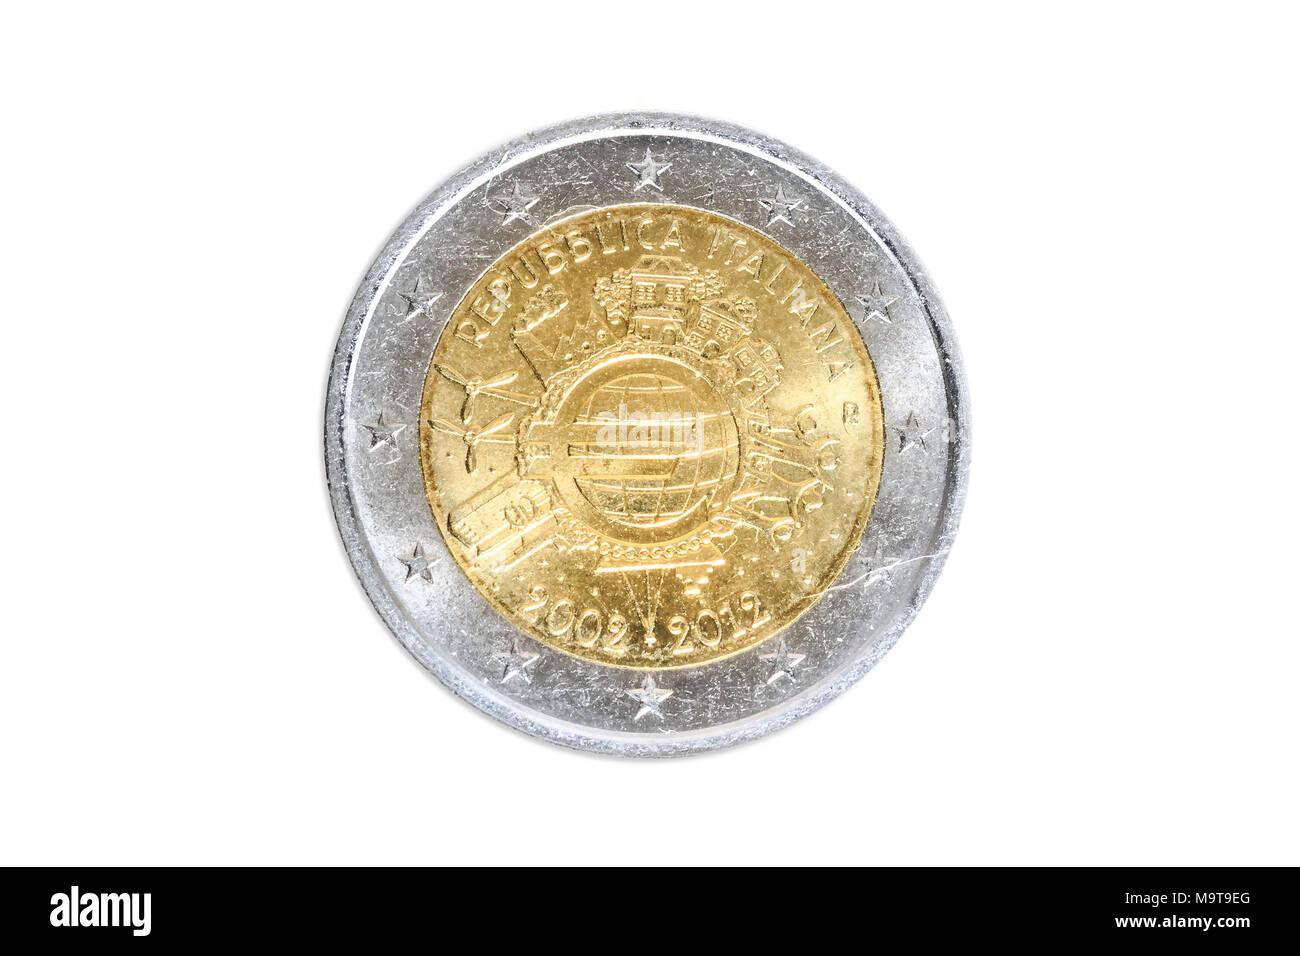 Italian Euro Coins Stock Photos & Italian Euro Coins Stock Images - Alamy